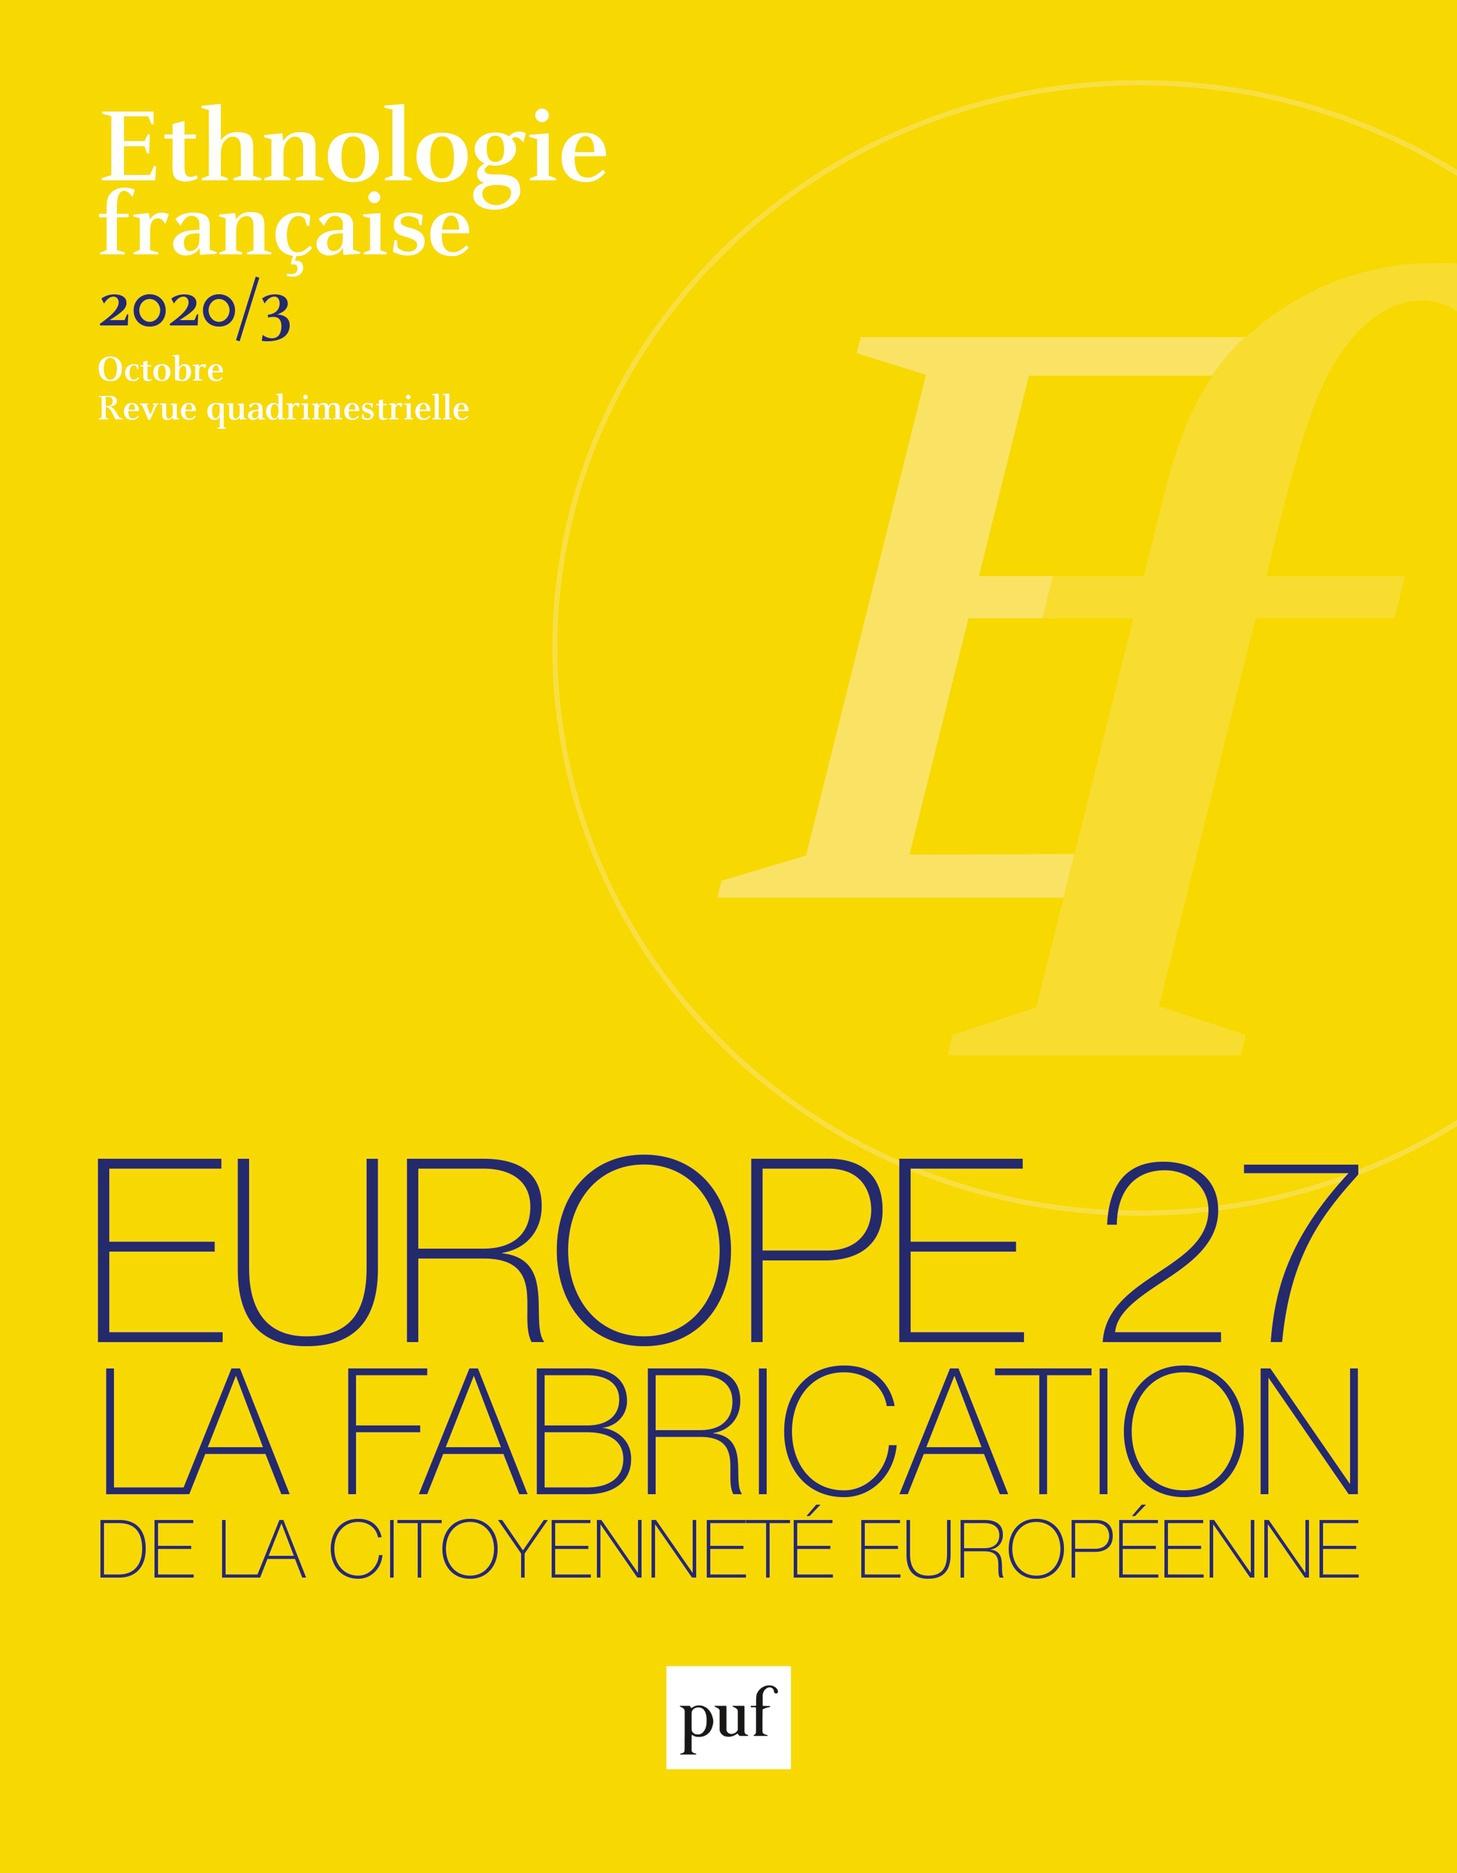 Europe 27: Building European citizenship